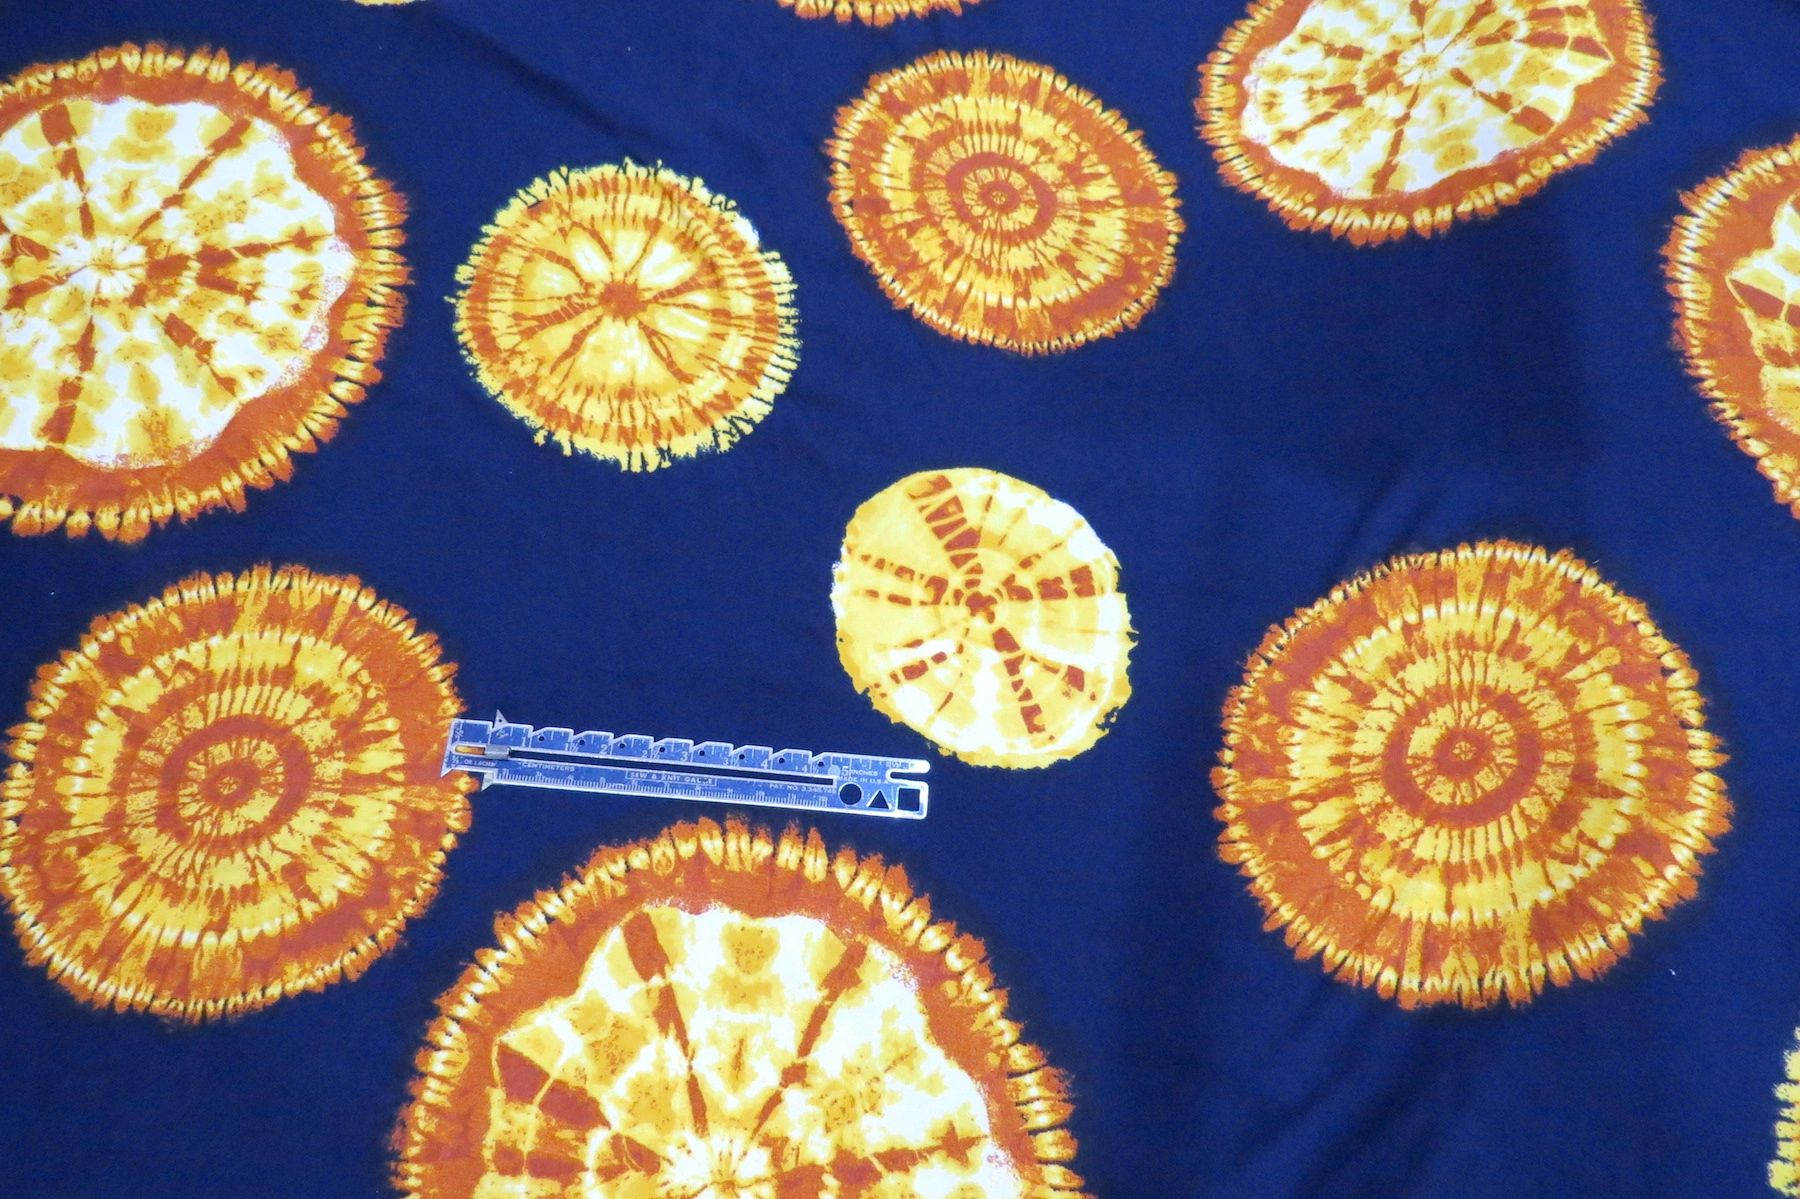 Navy Blue Dandelion Chestnut White Double Brushed Jersey Knit